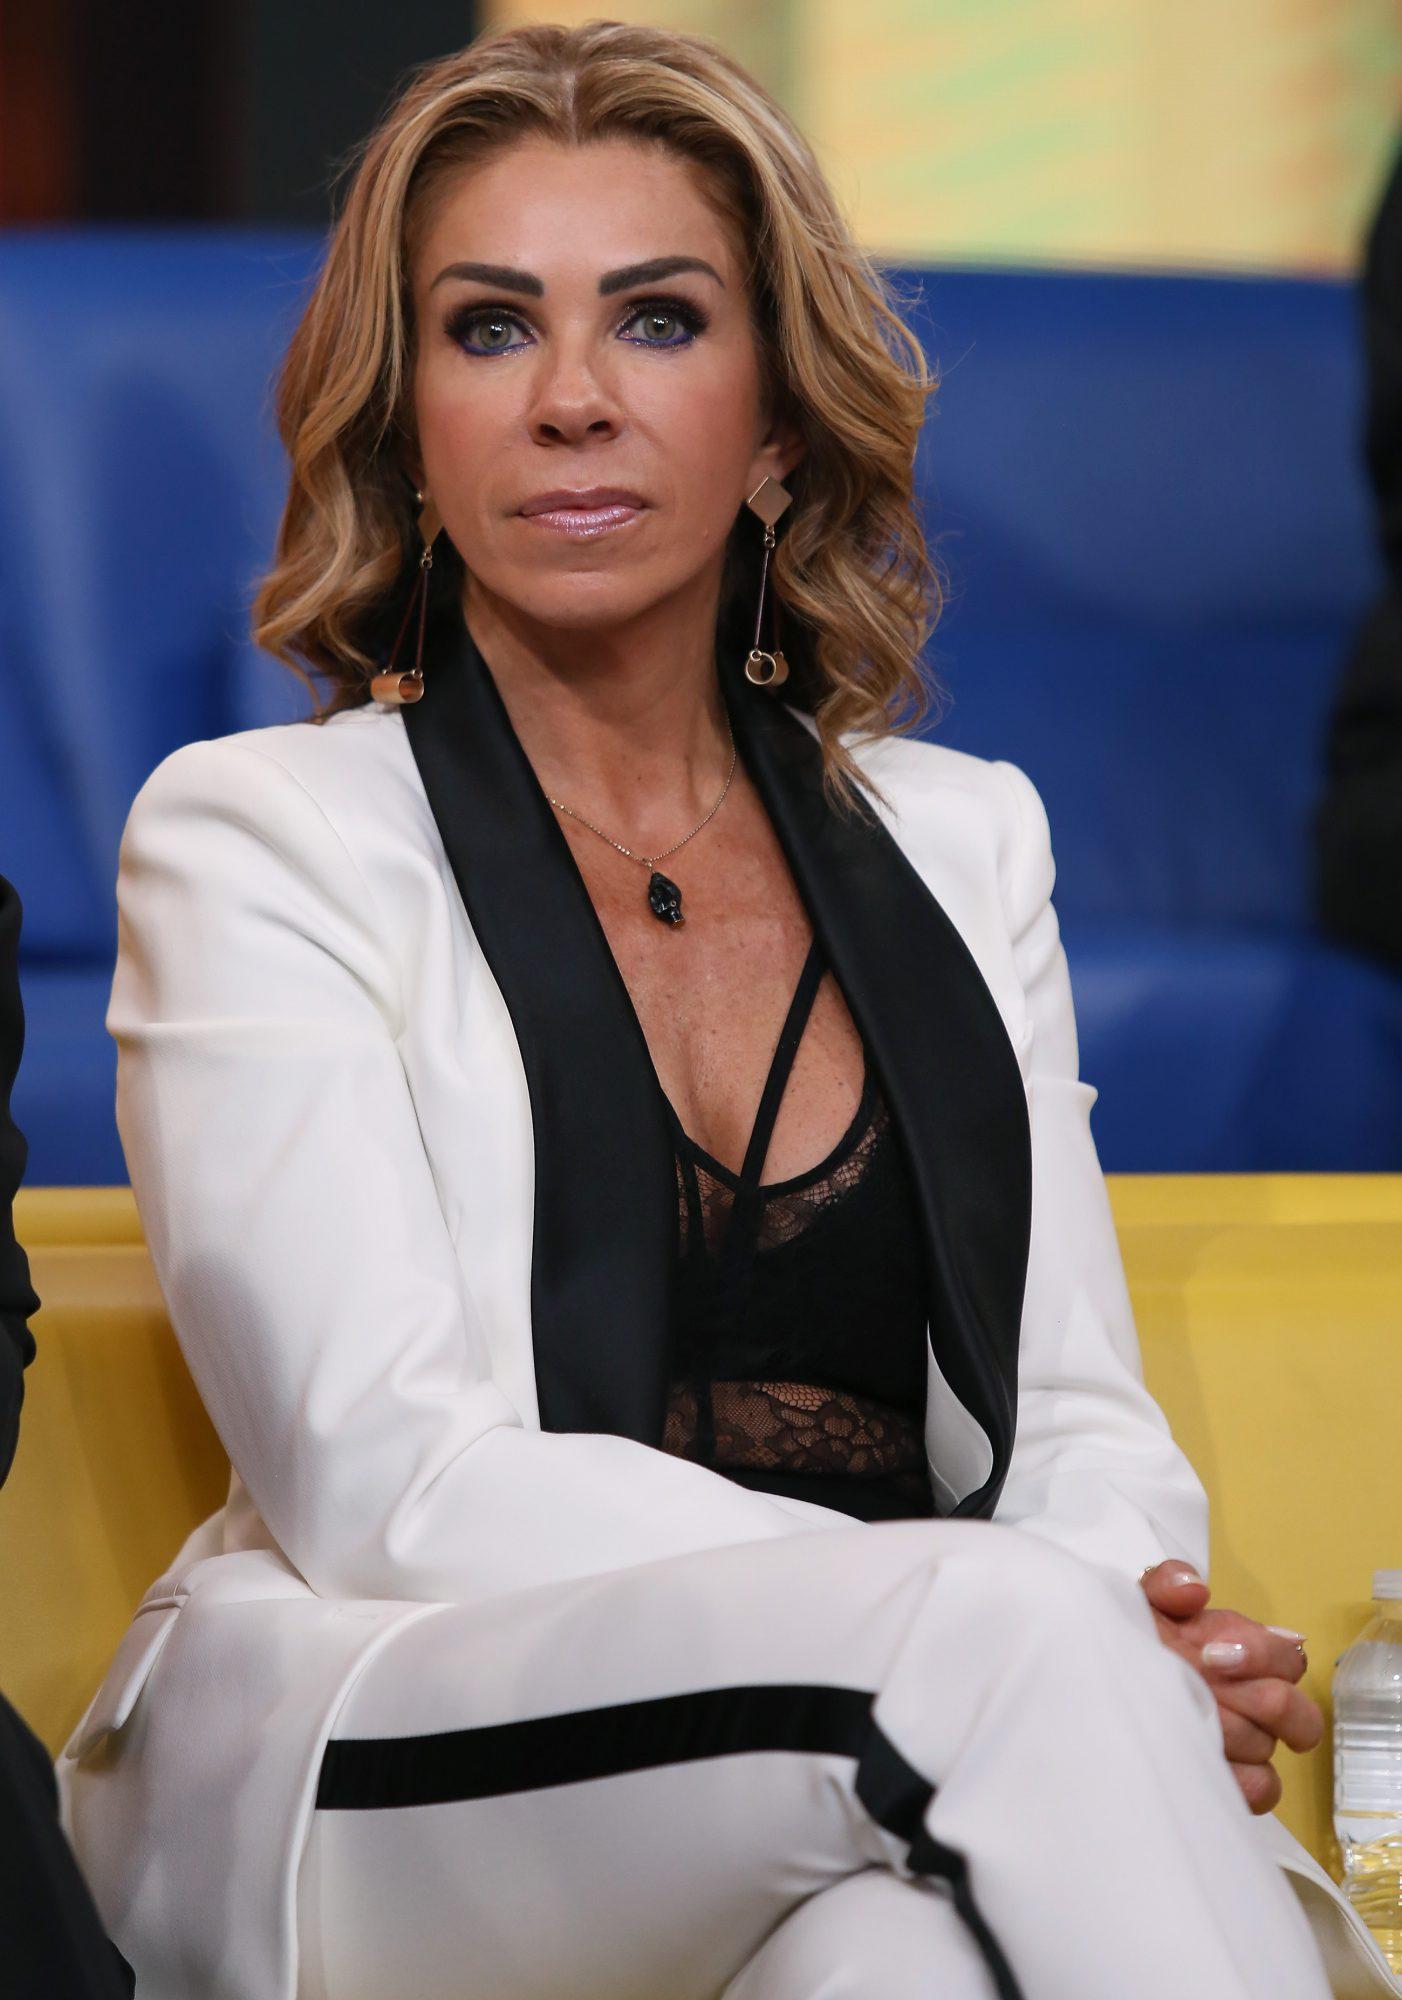 Rocio Sánchez Azuara